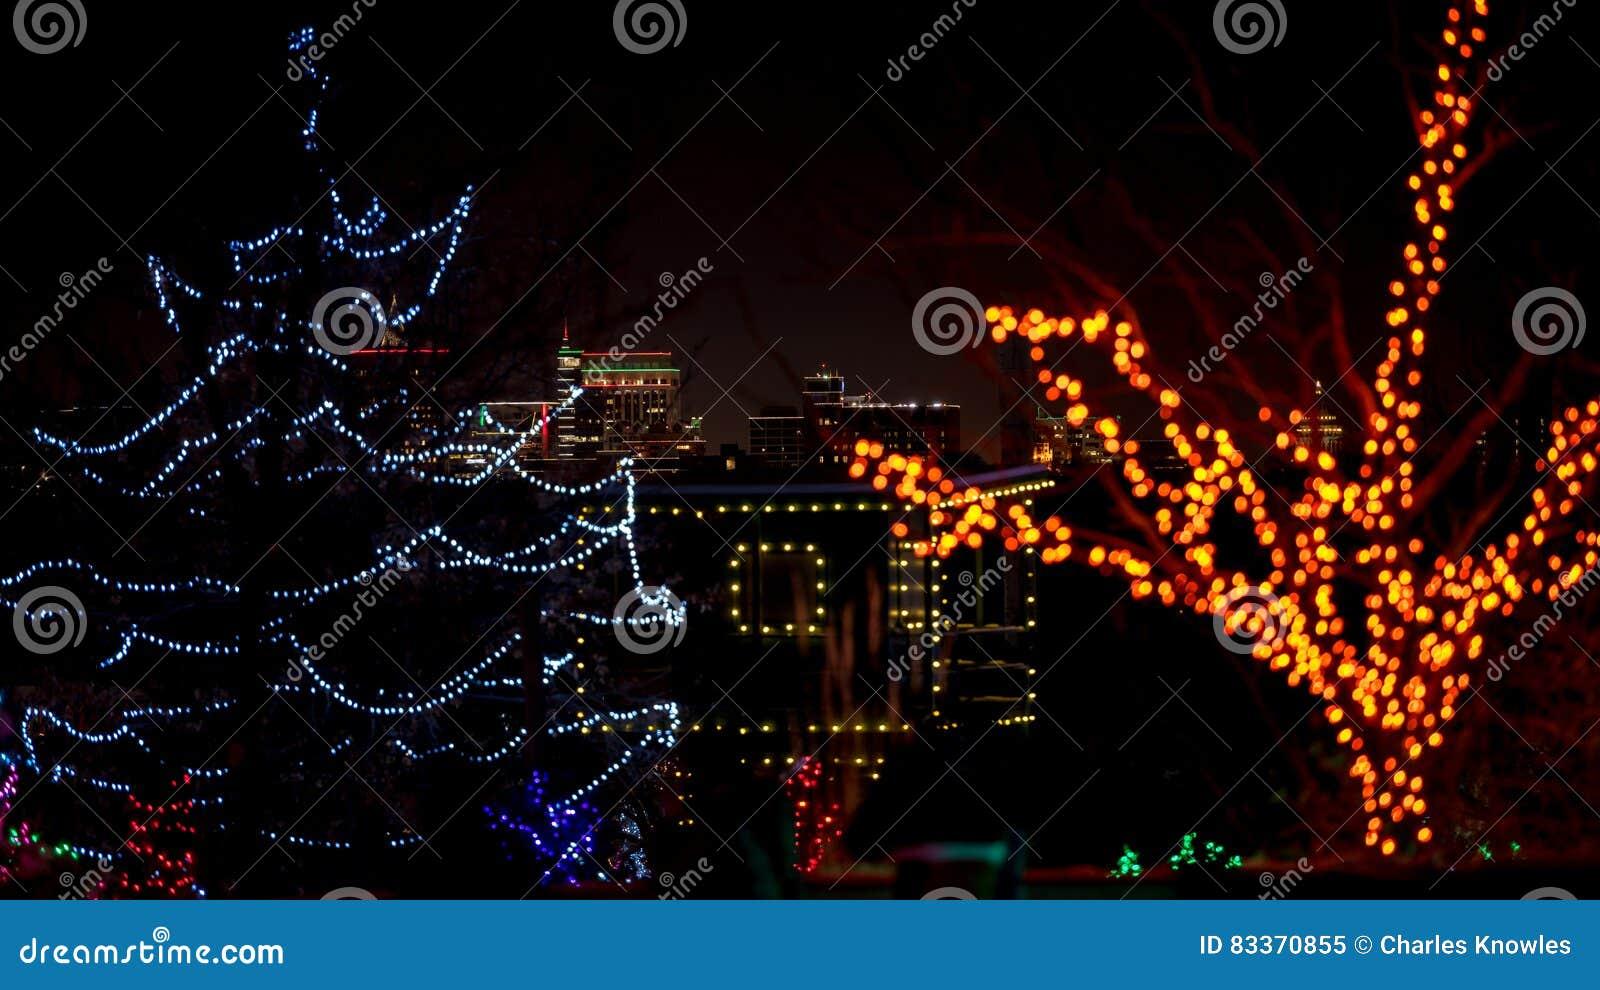 Christmas Lights Boise.Christmas Lights And Bosie Idaho Skyline At Night Stock